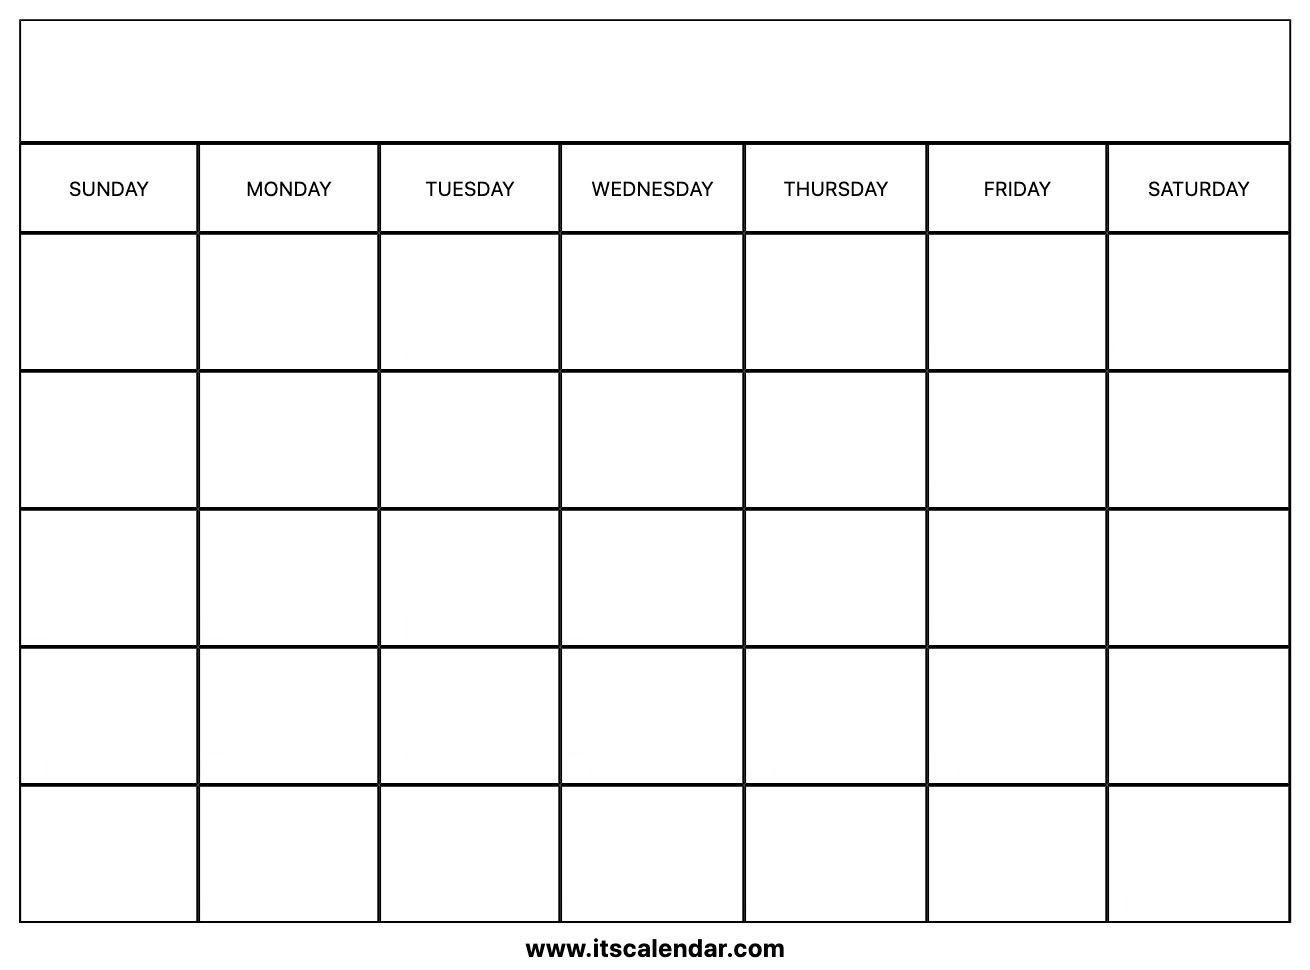 Printable Blank Calendar | Blank calender, Calender ...